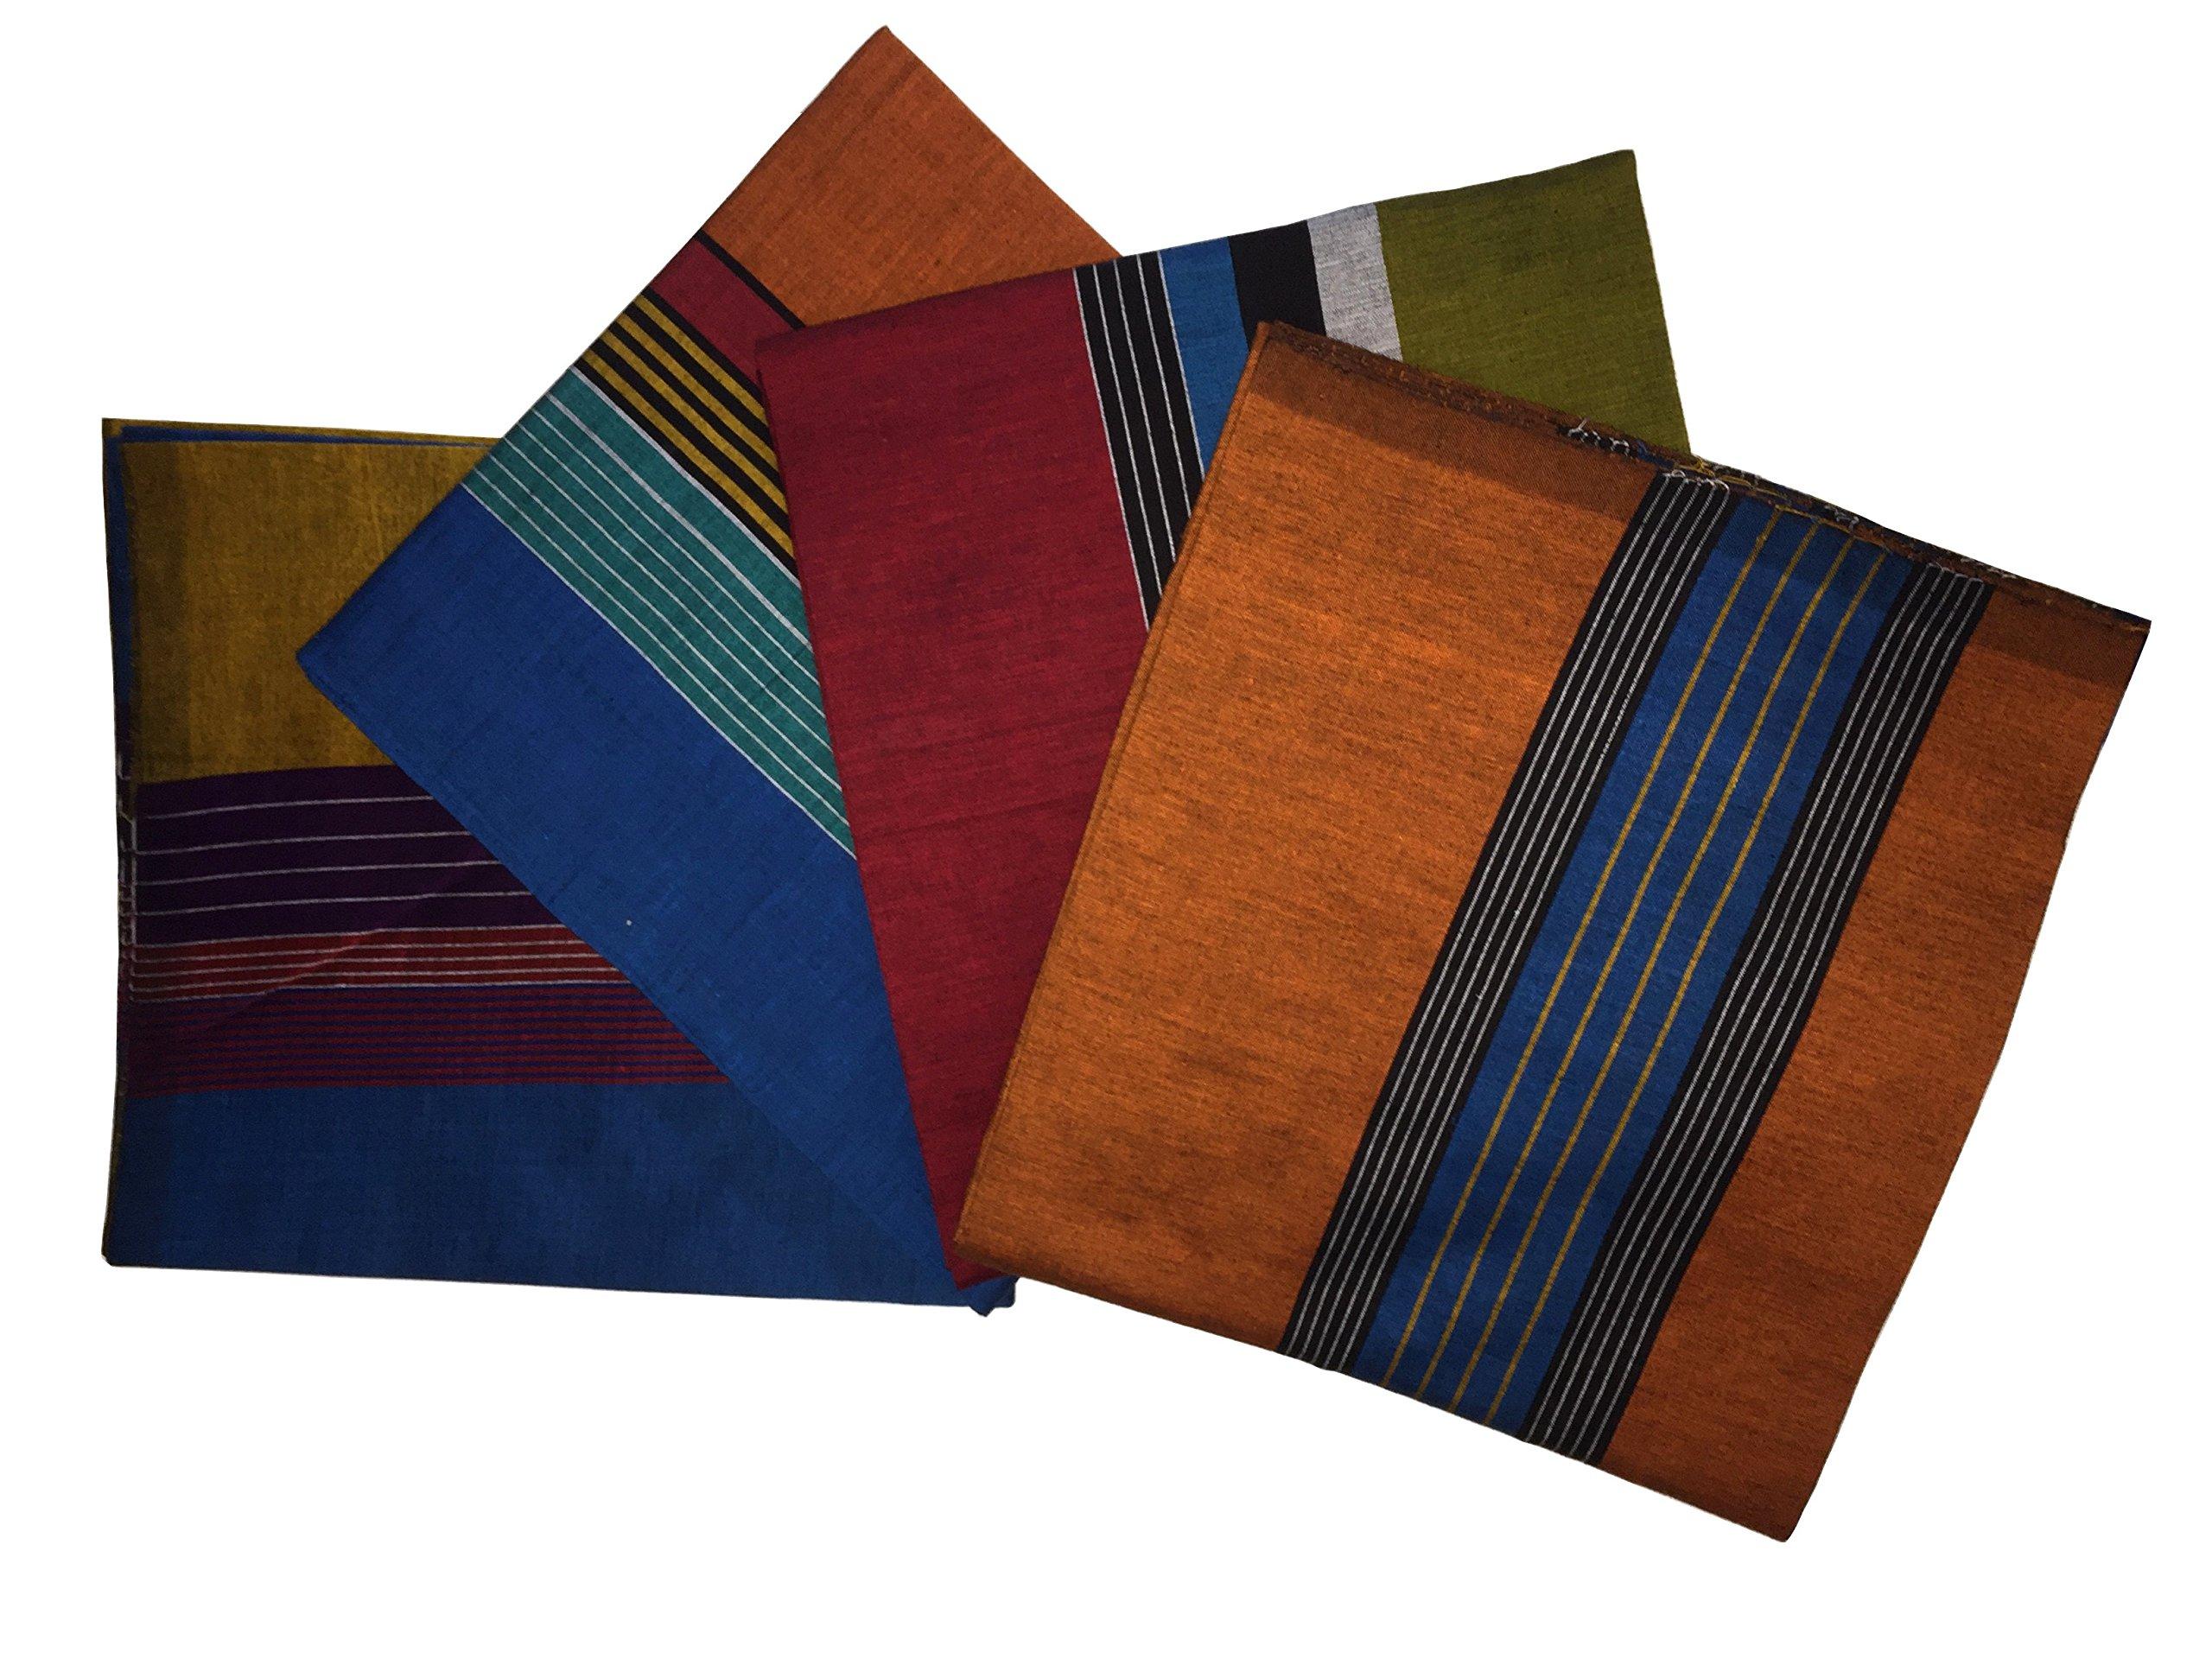 ReenaHANDS Lungi Sarong Mens Handloom Lungi Sarong 100% Cotton. Stitched Tube Sarong. Assorted Color/Design by ReenaHANDS (Image #5)